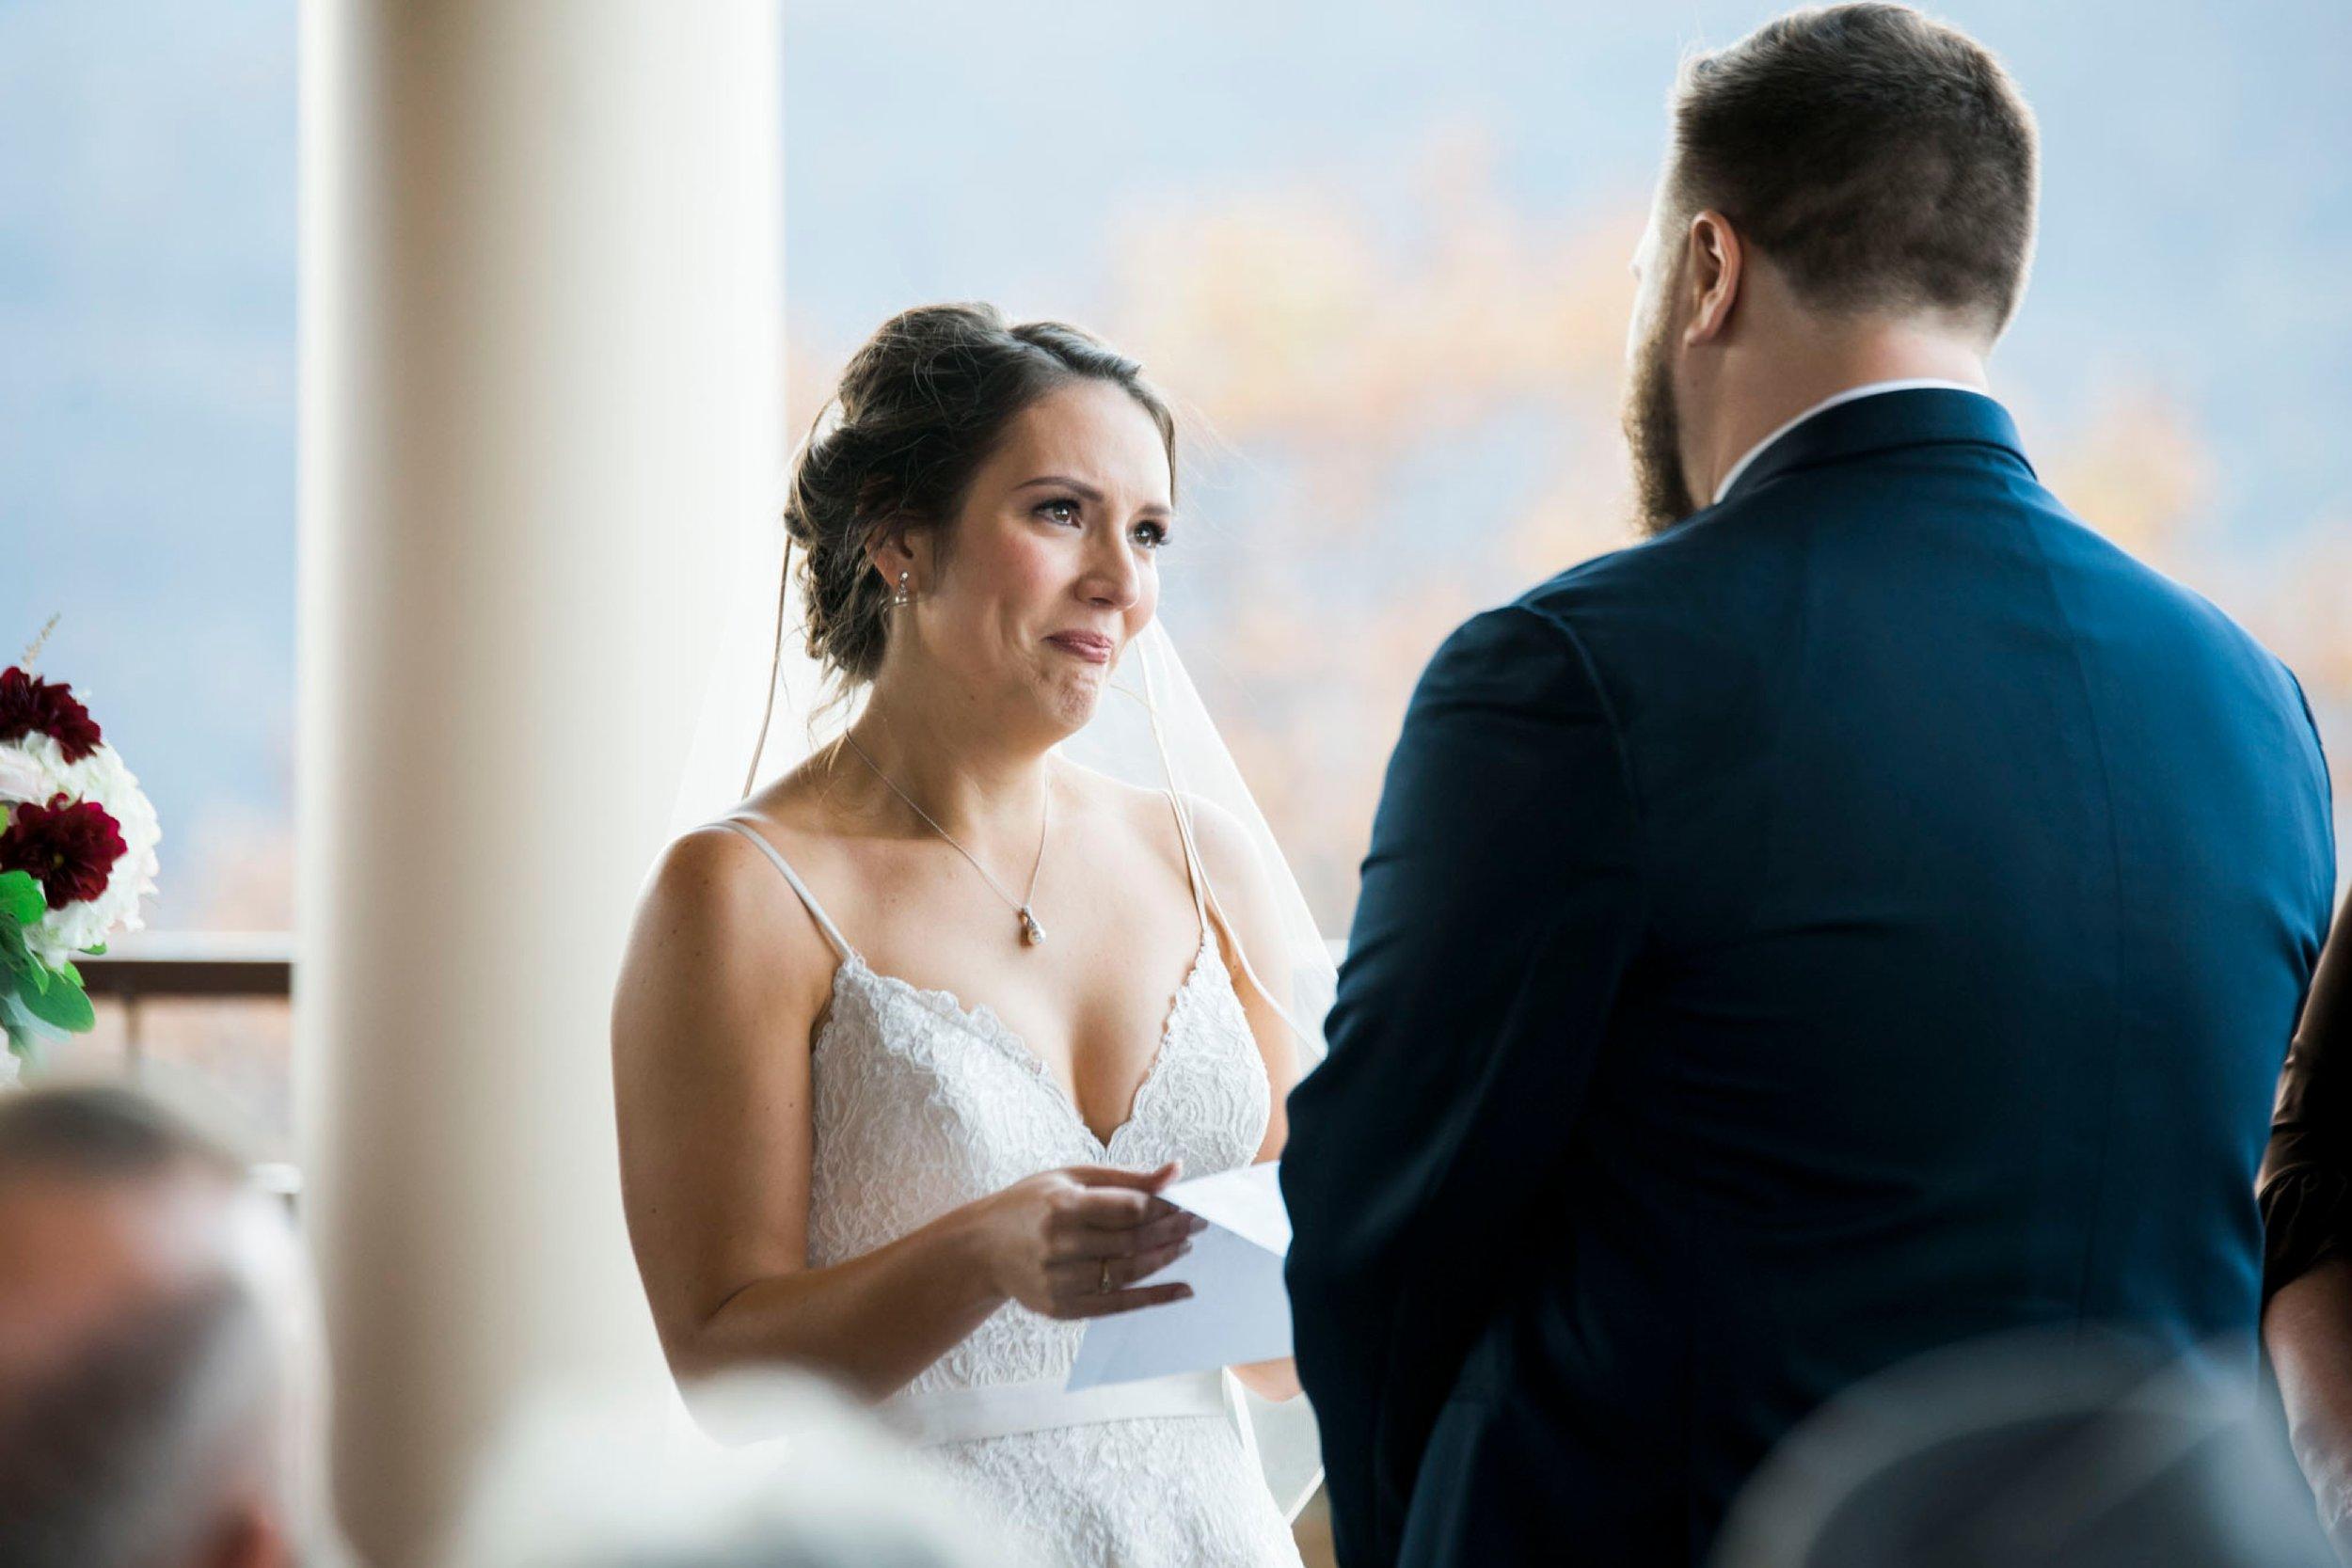 IrvineEstate_LexingtonVA_Wedding_FallWedding_VirginiaWeddingPhotographer 65.jpg